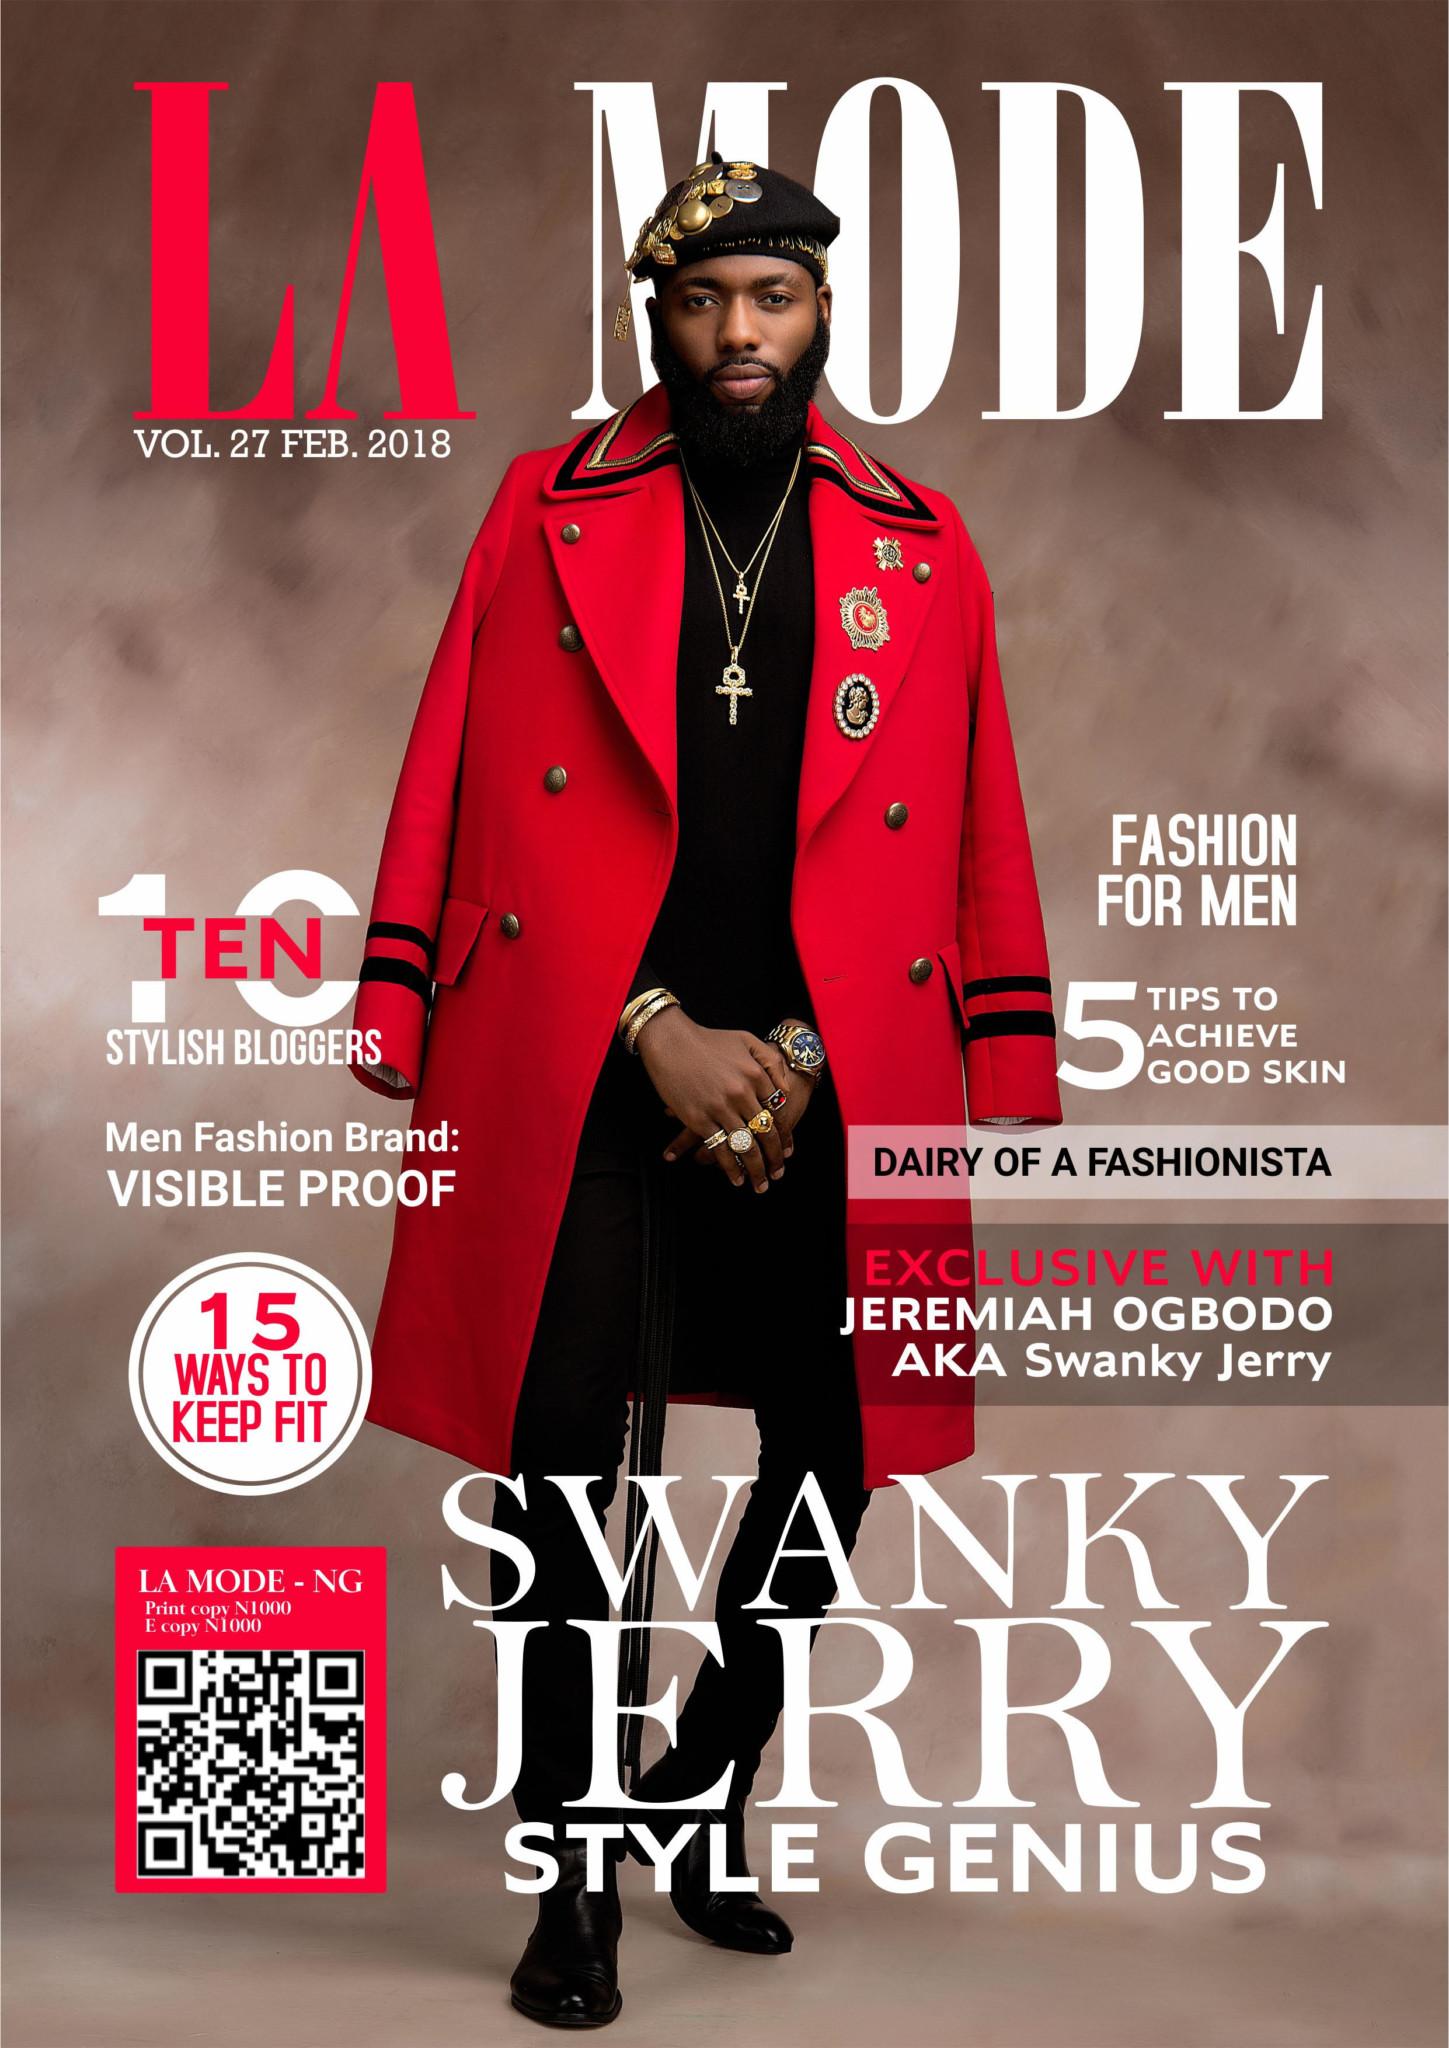 stylist swanky jerry covers la mode magazine 39 s february. Black Bedroom Furniture Sets. Home Design Ideas